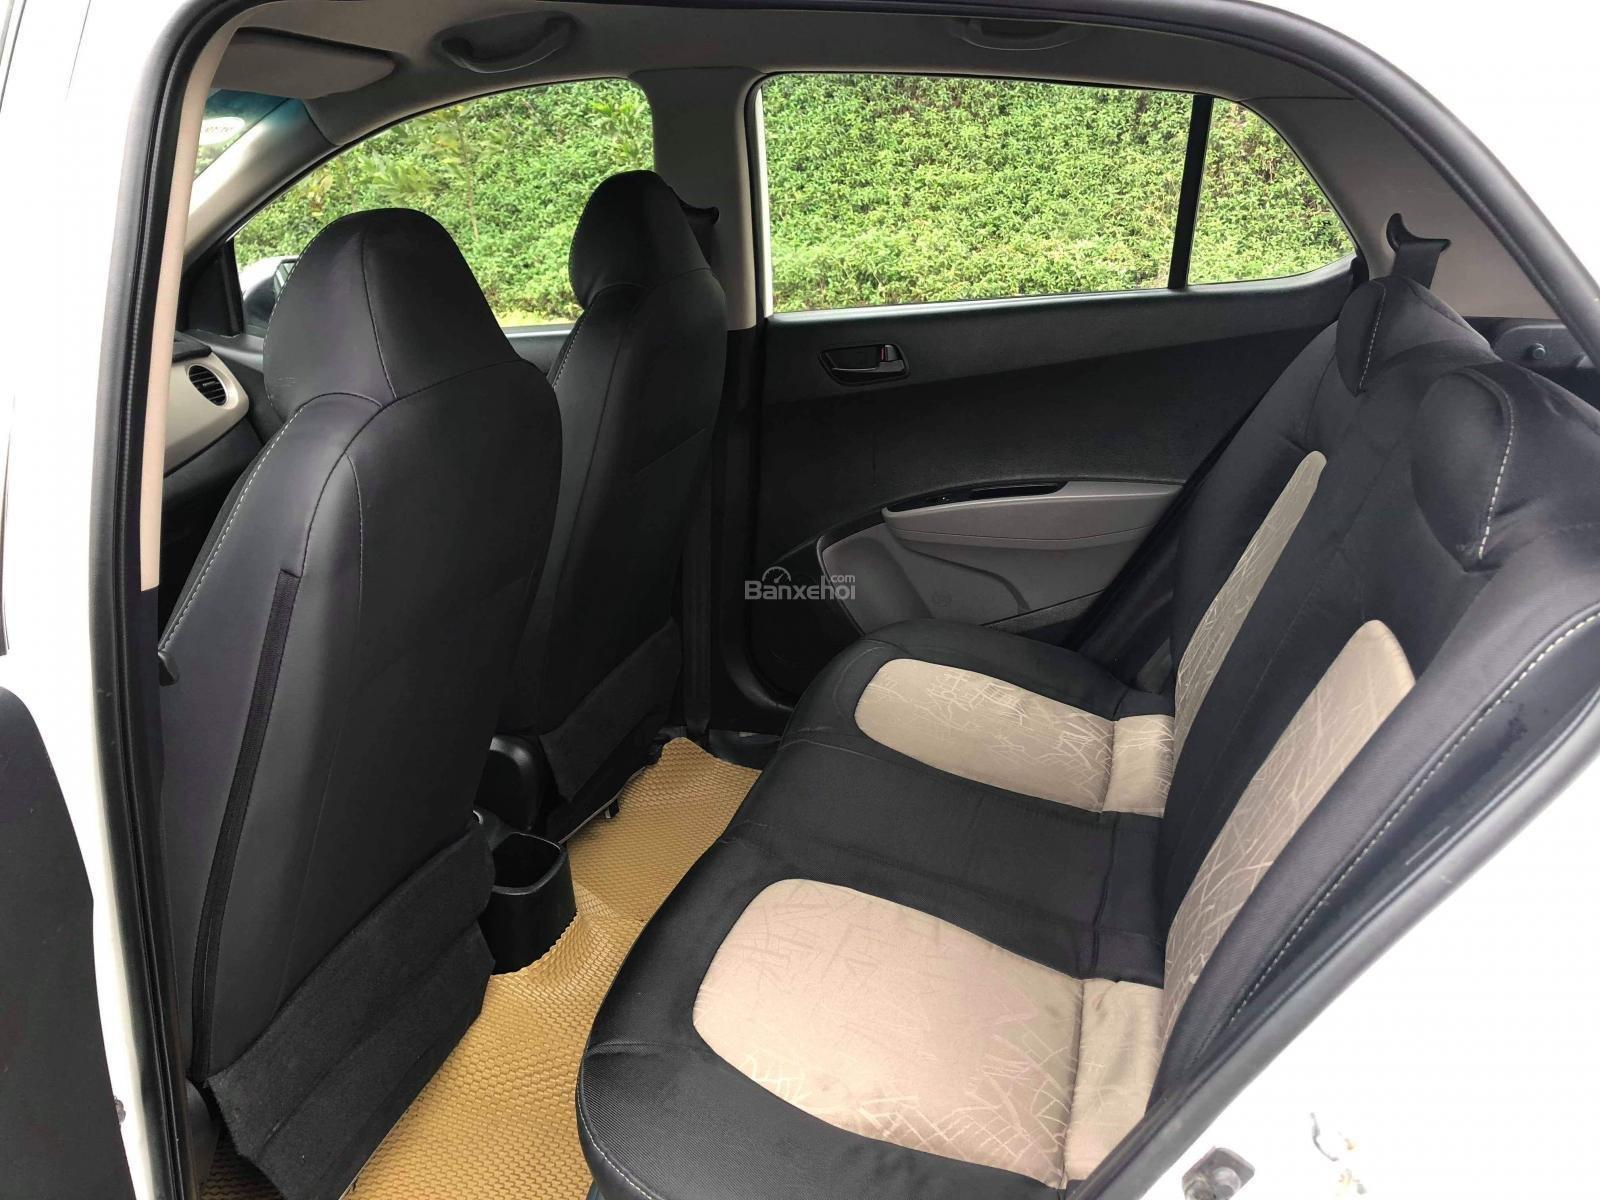 Bán xe Hyundai Grand i10 đời 2014, giá 248tr-4